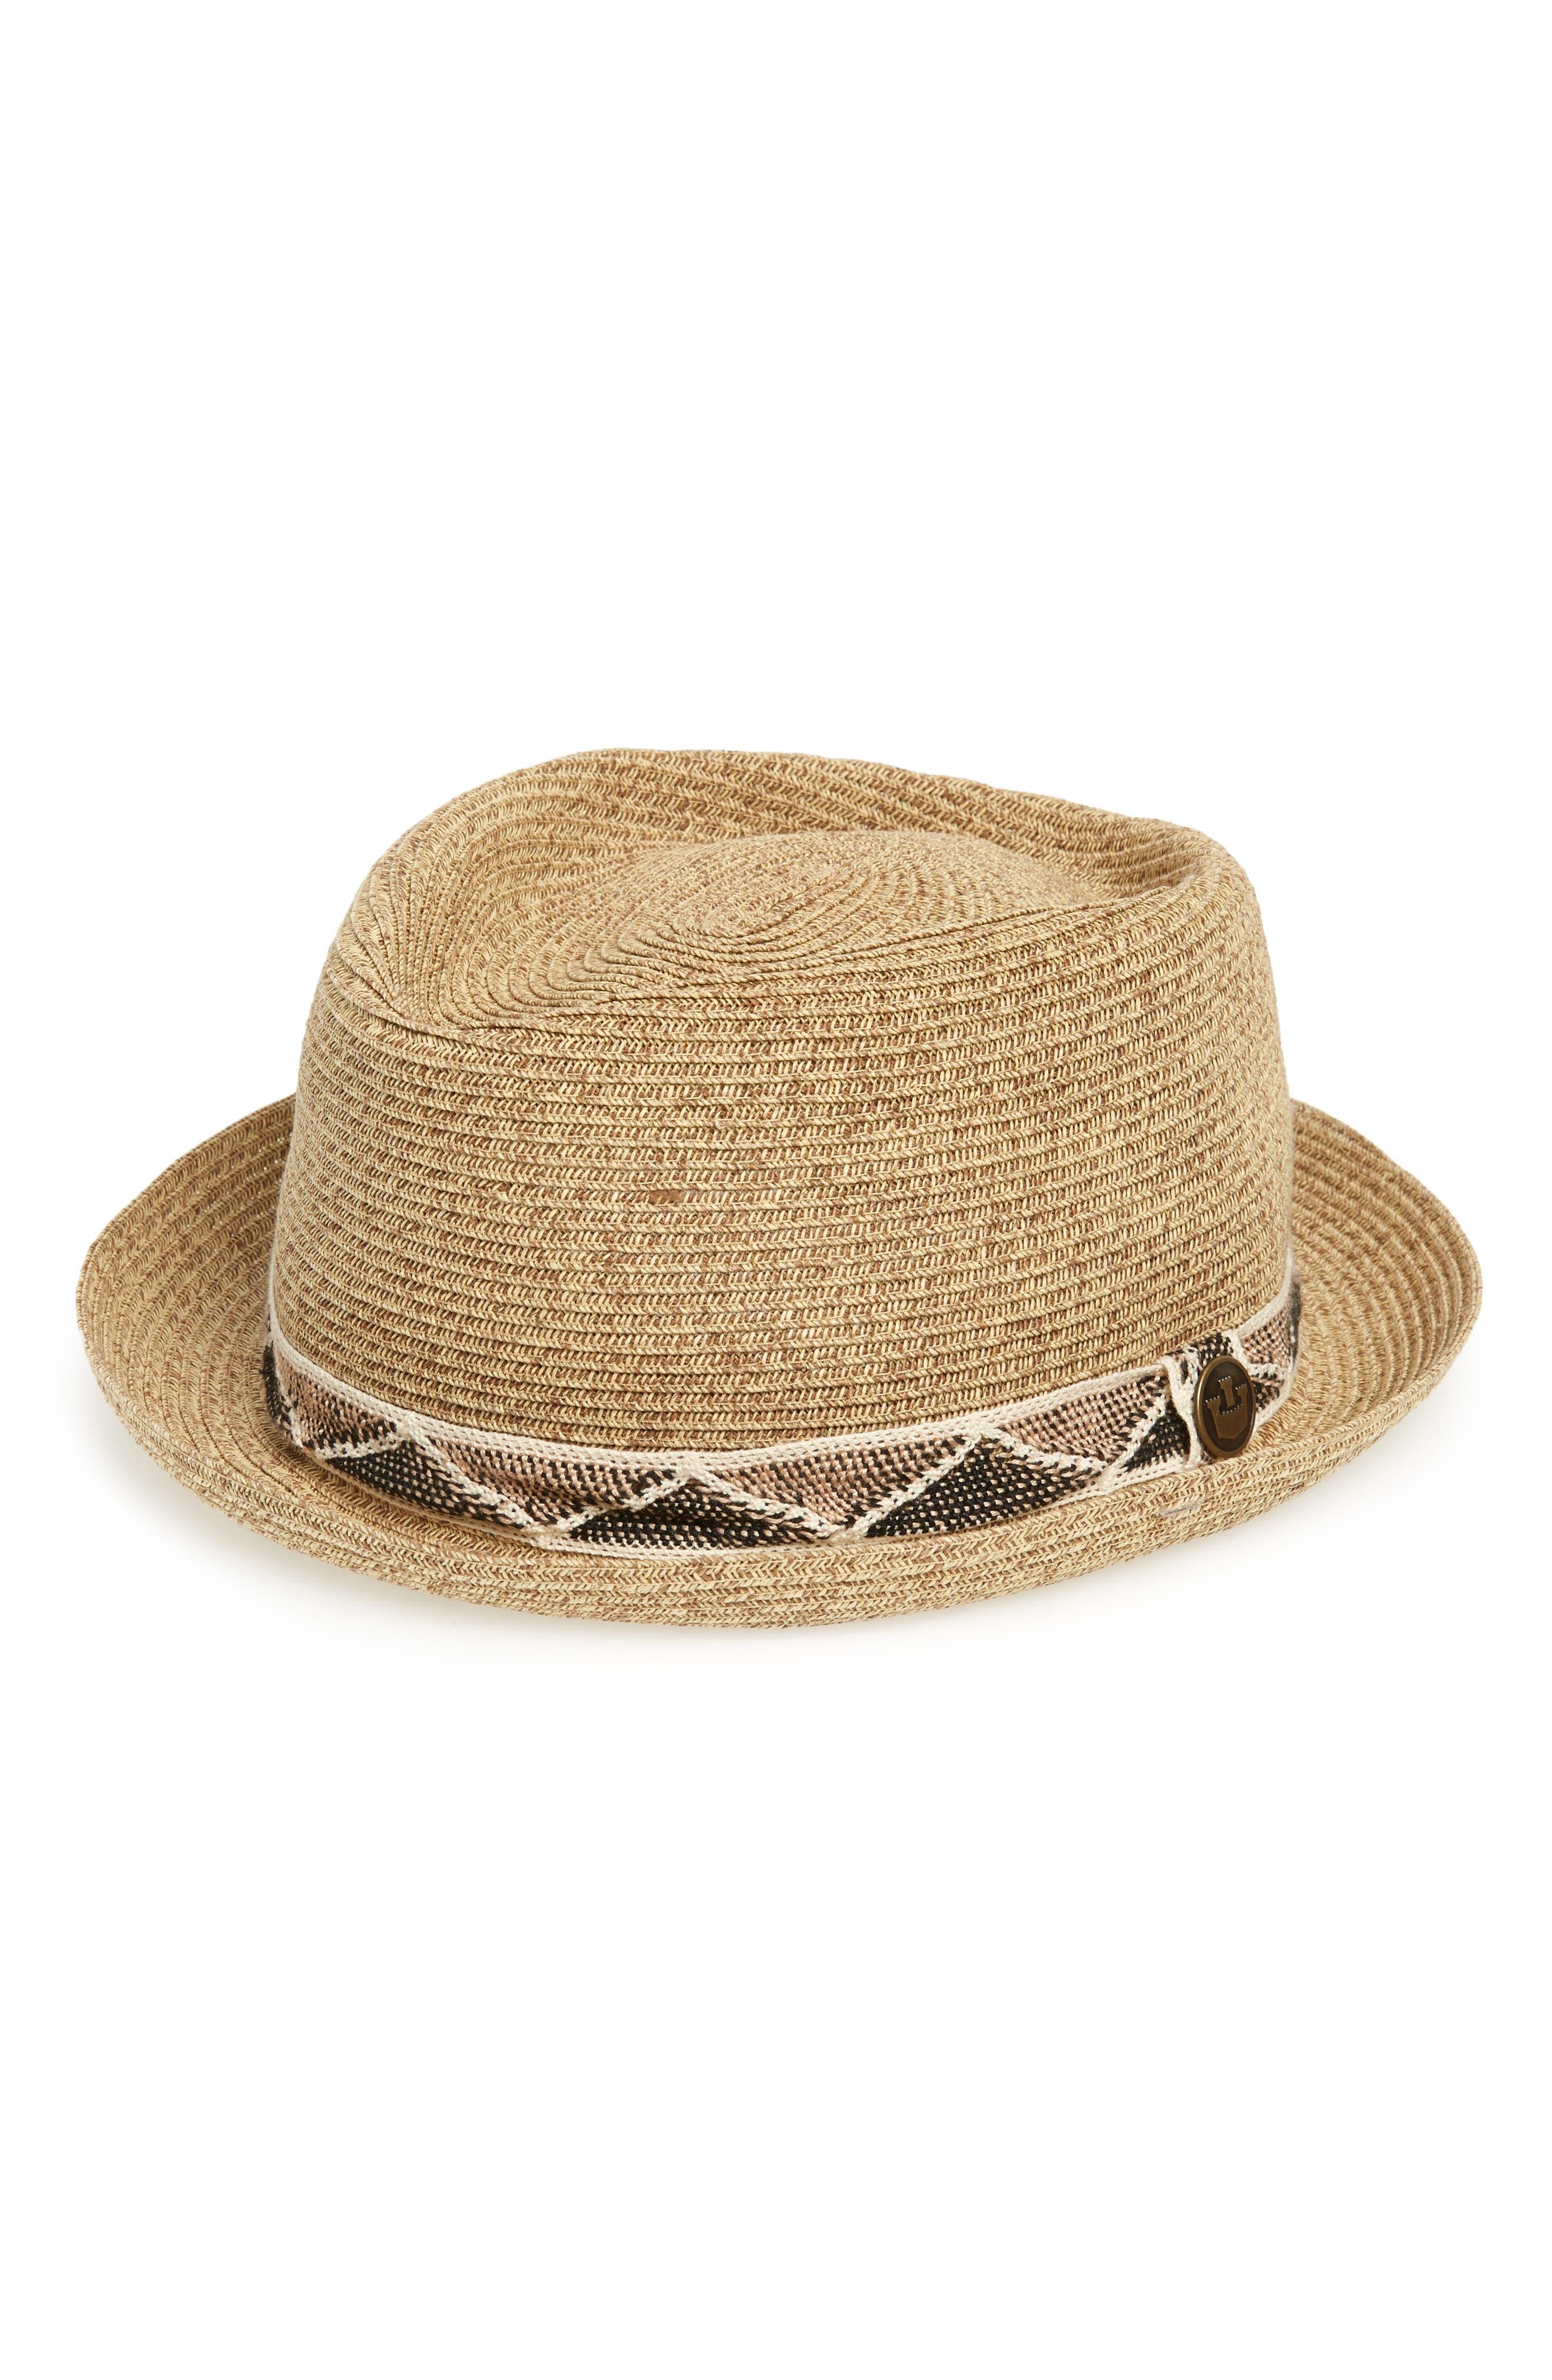 Albuquerque Straw Hat,                             Main thumbnail 1, color,                             Brown